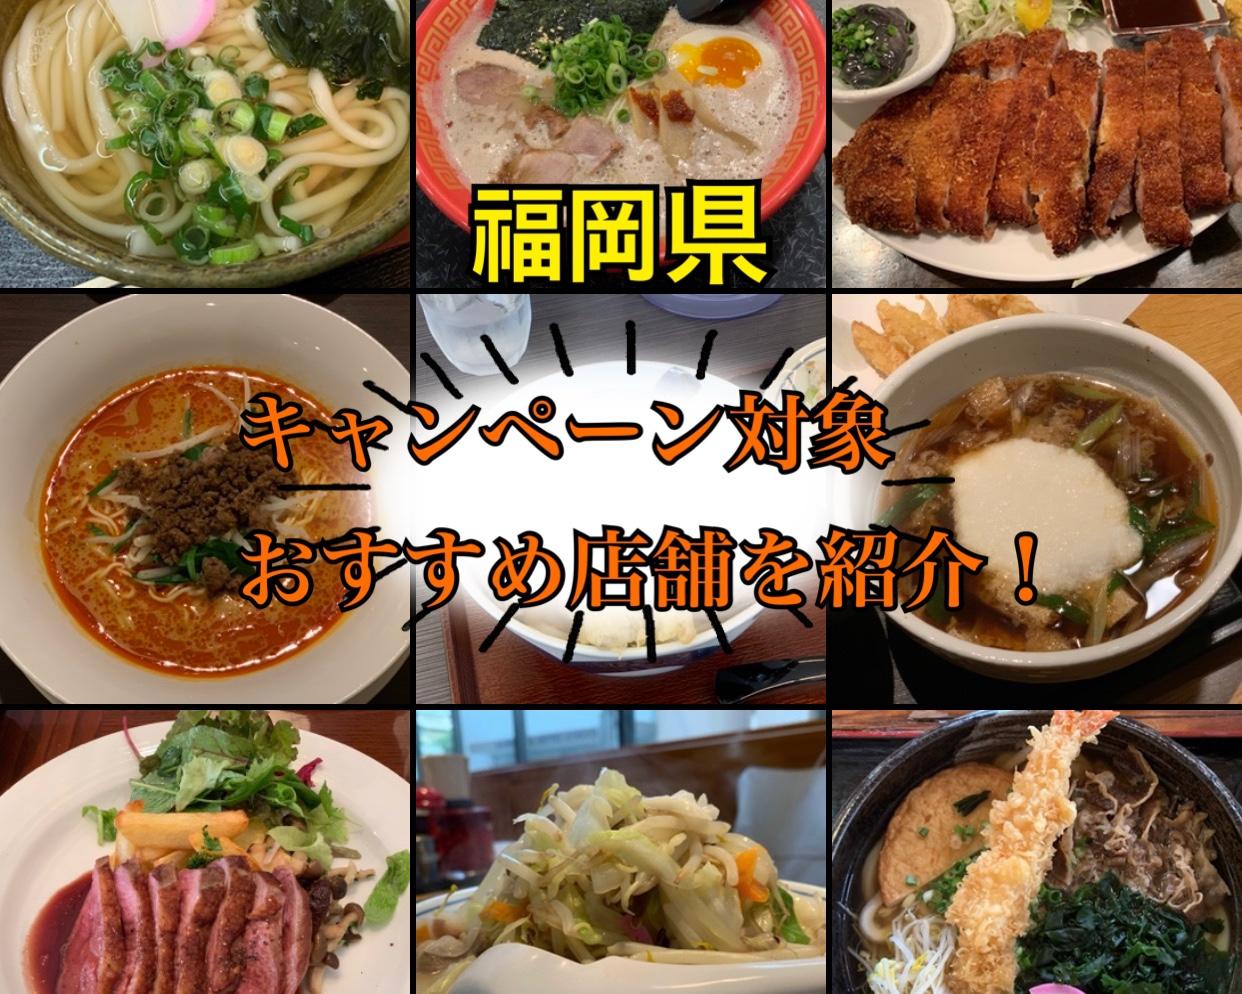 Go To Eatキャンペーンの福岡対象店舗